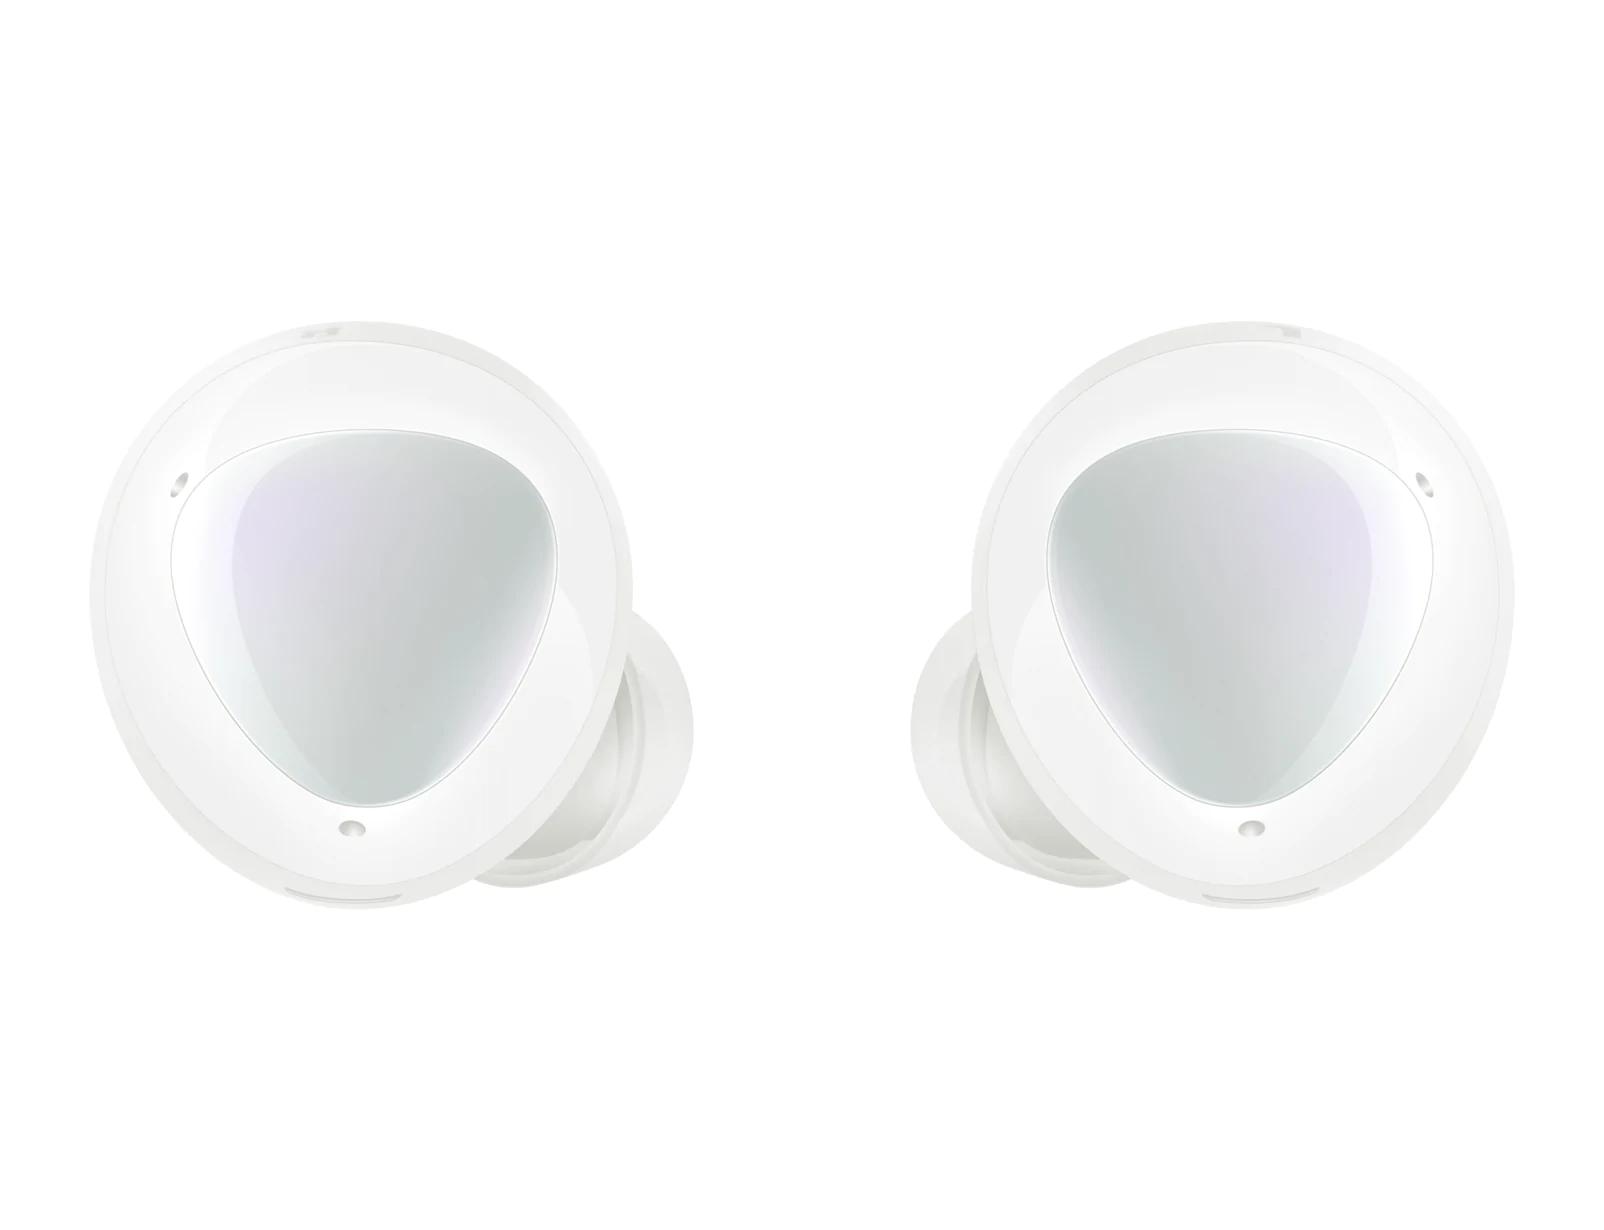 Qulaqlıq Samsung Galaxy Buds + White SM-R175NZWASER RFAN20BFLEE - 2